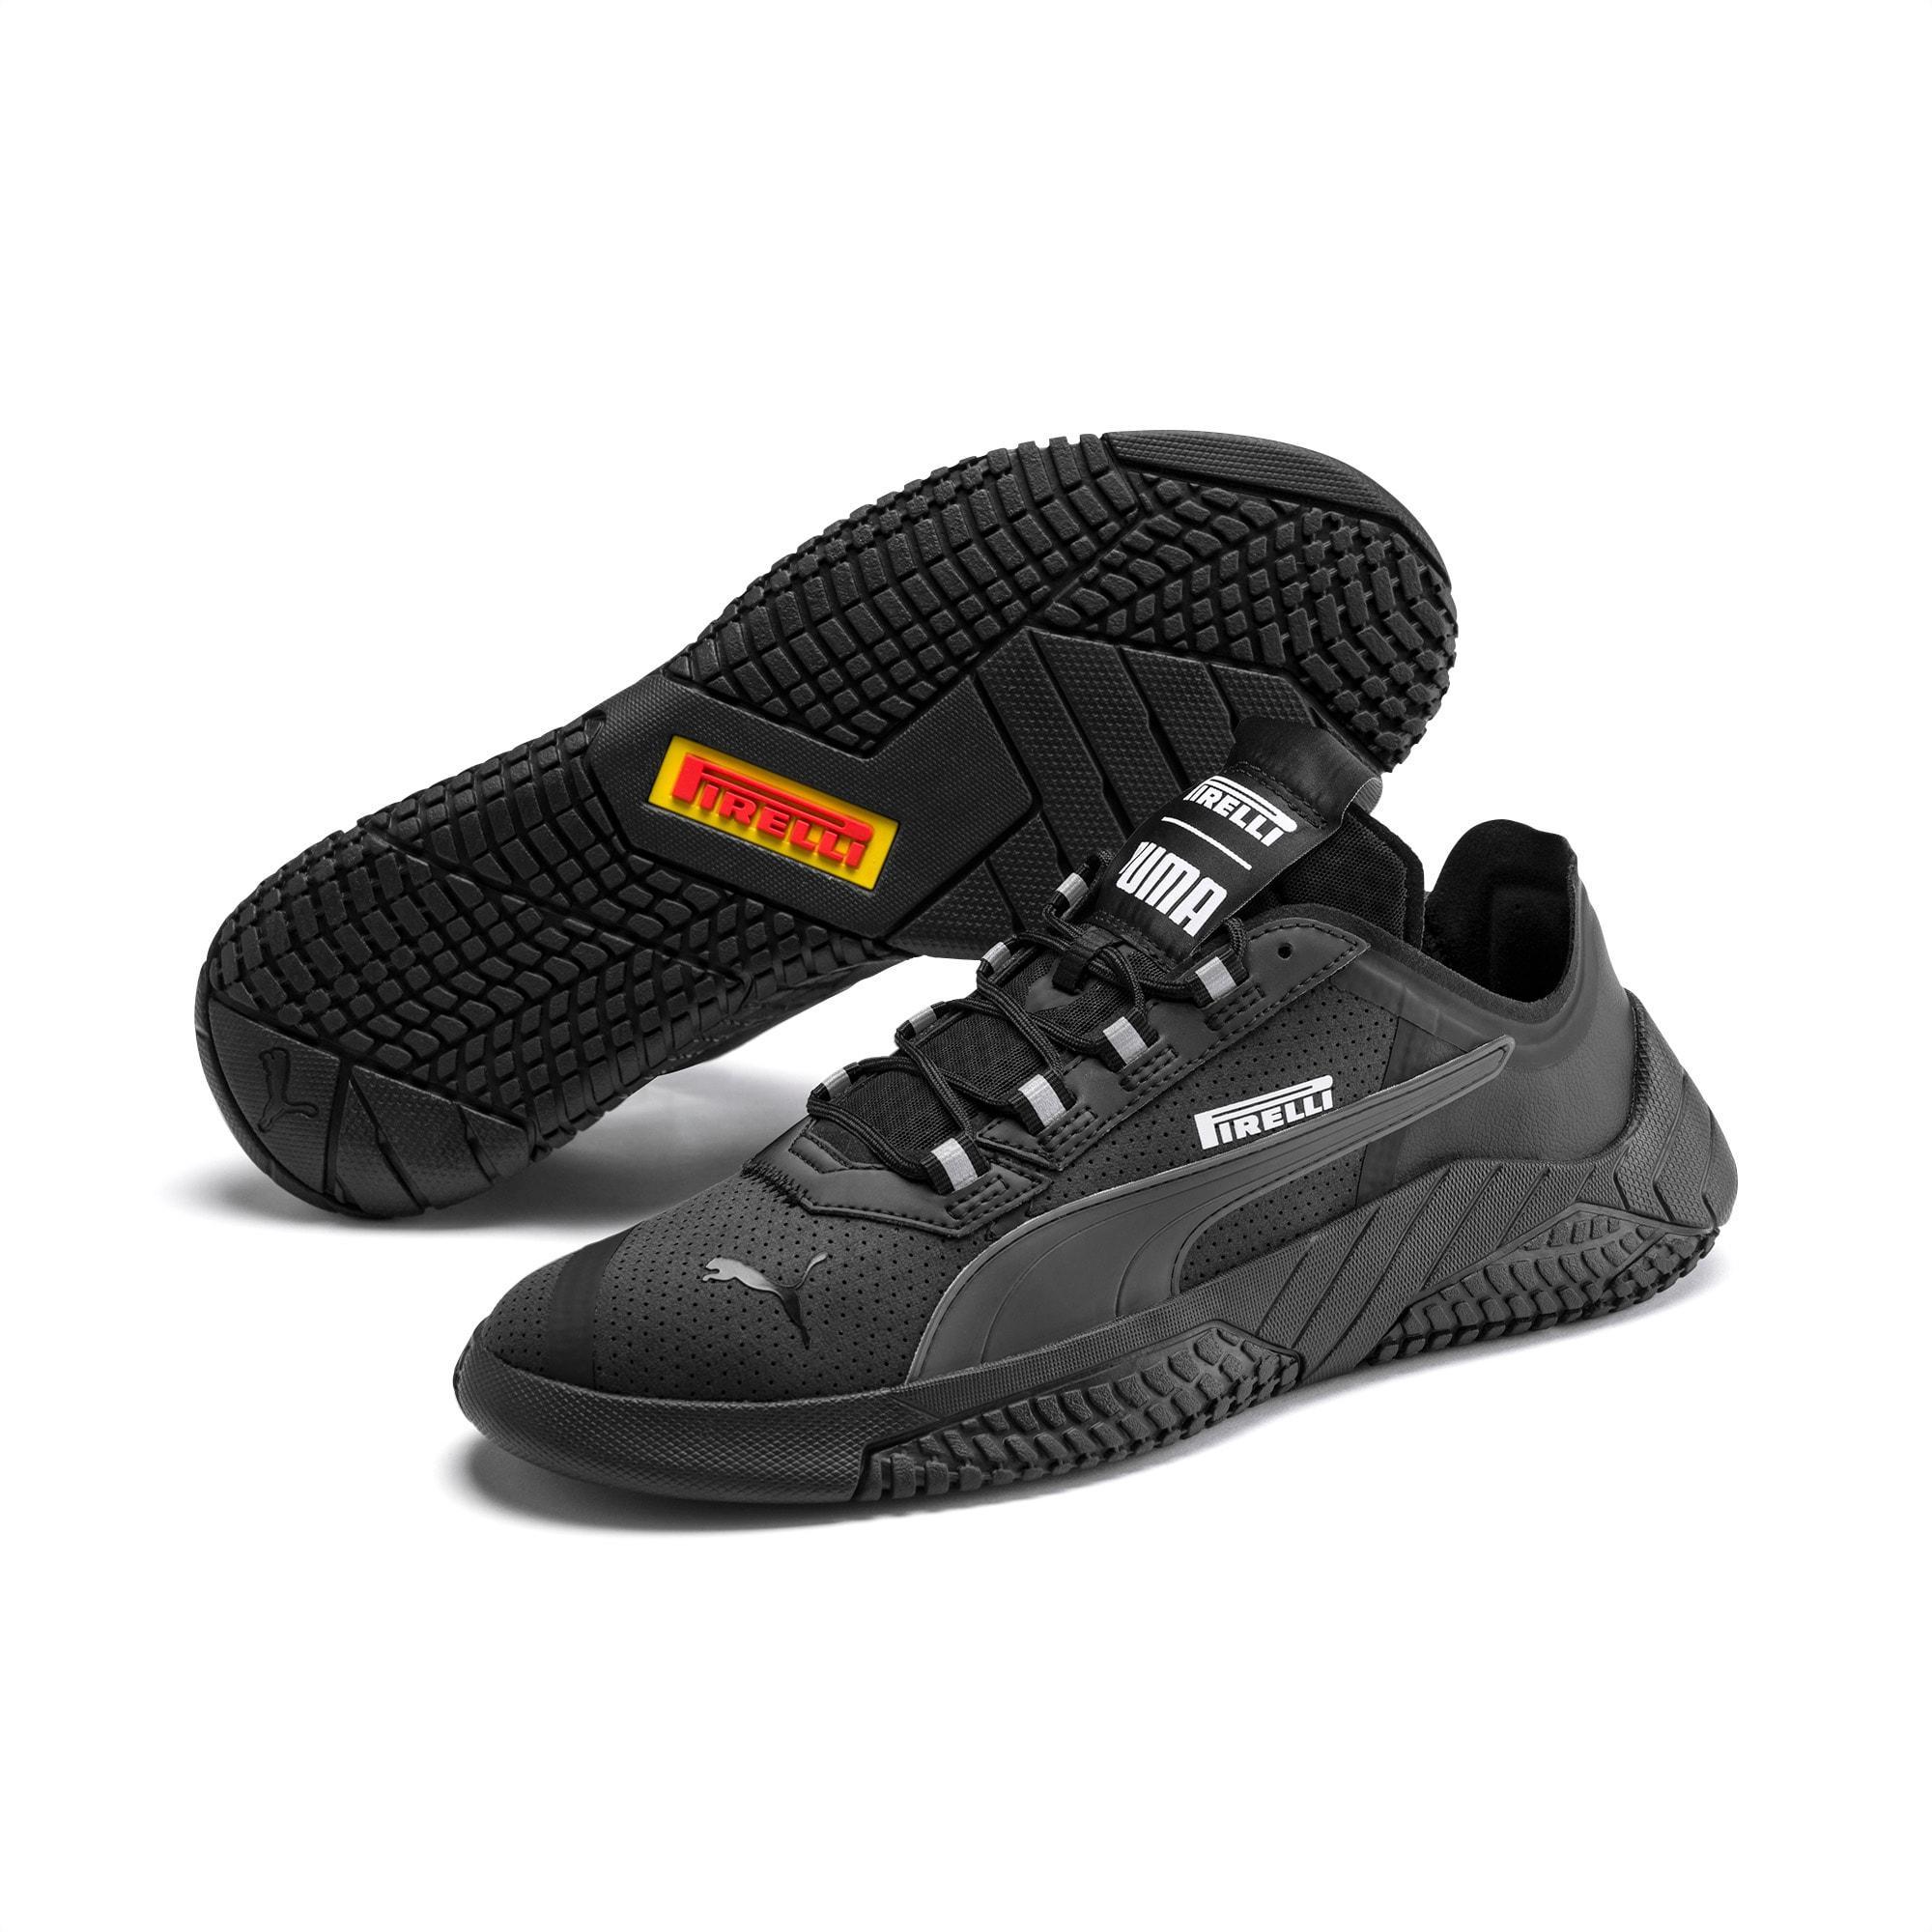 PUMA Suede Replicat-x Pirelli Motorsport Shoes in p Black-p Black ...